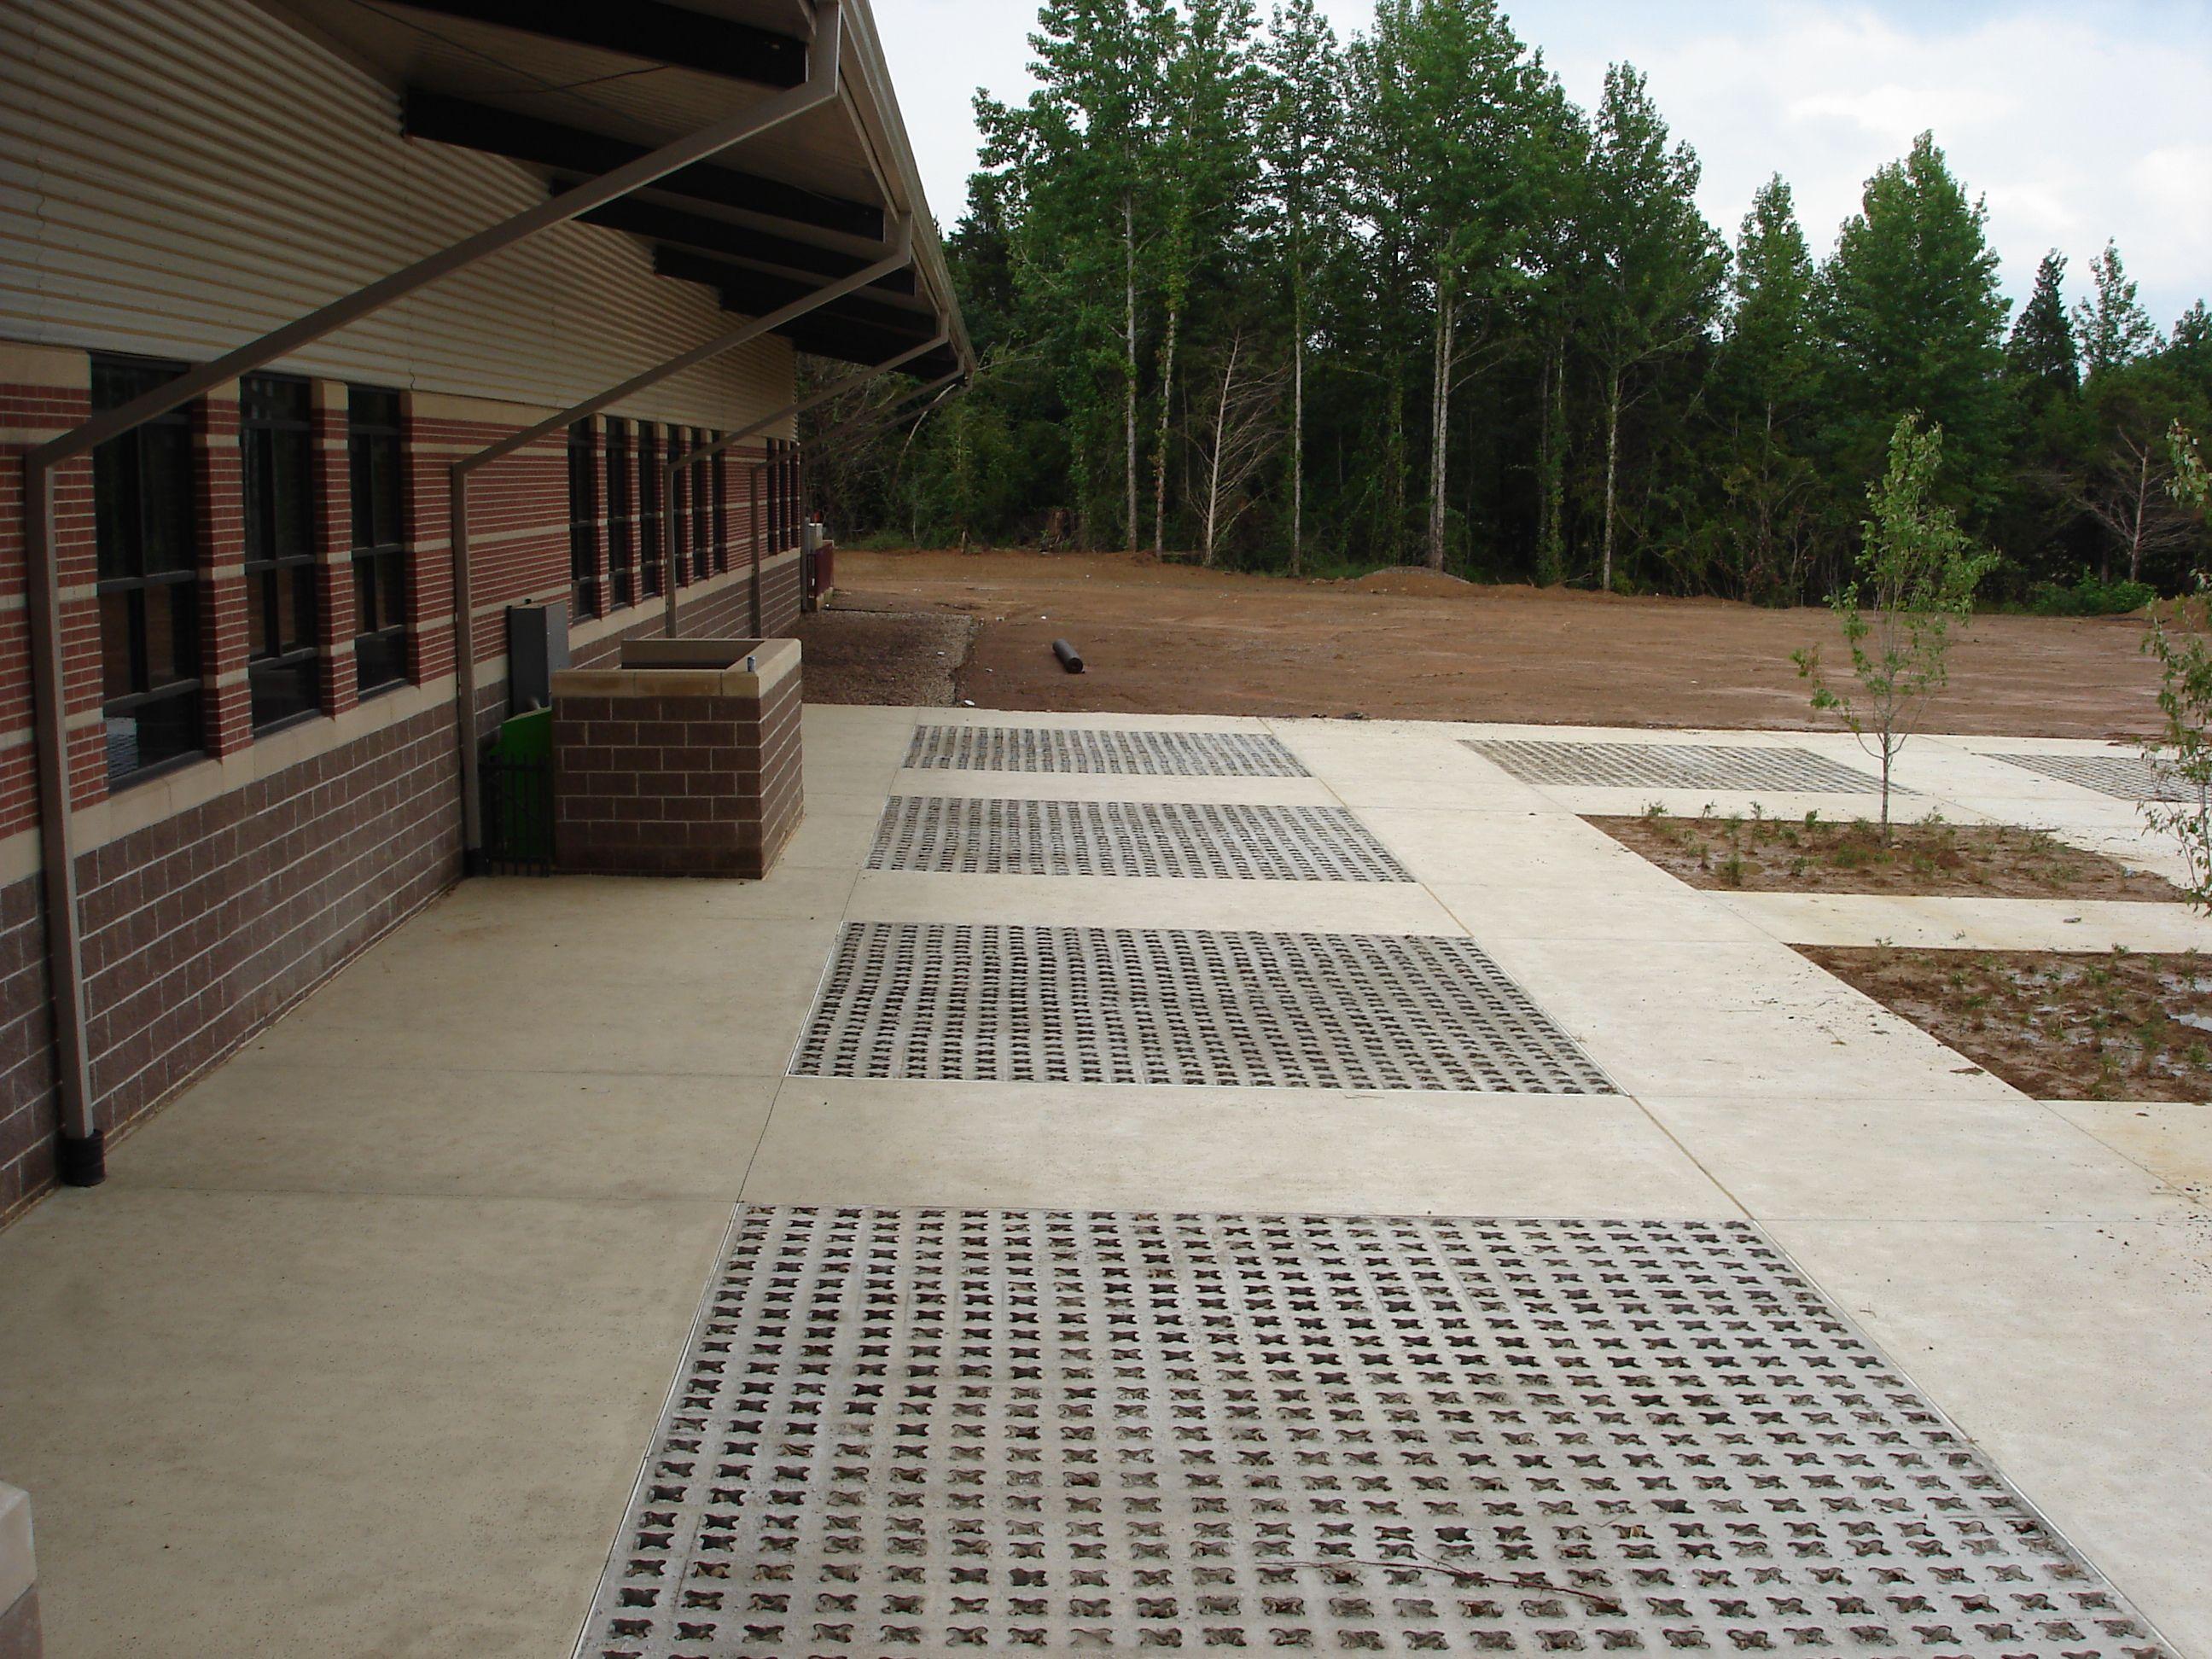 Grasscrete - Wooster Elementary School